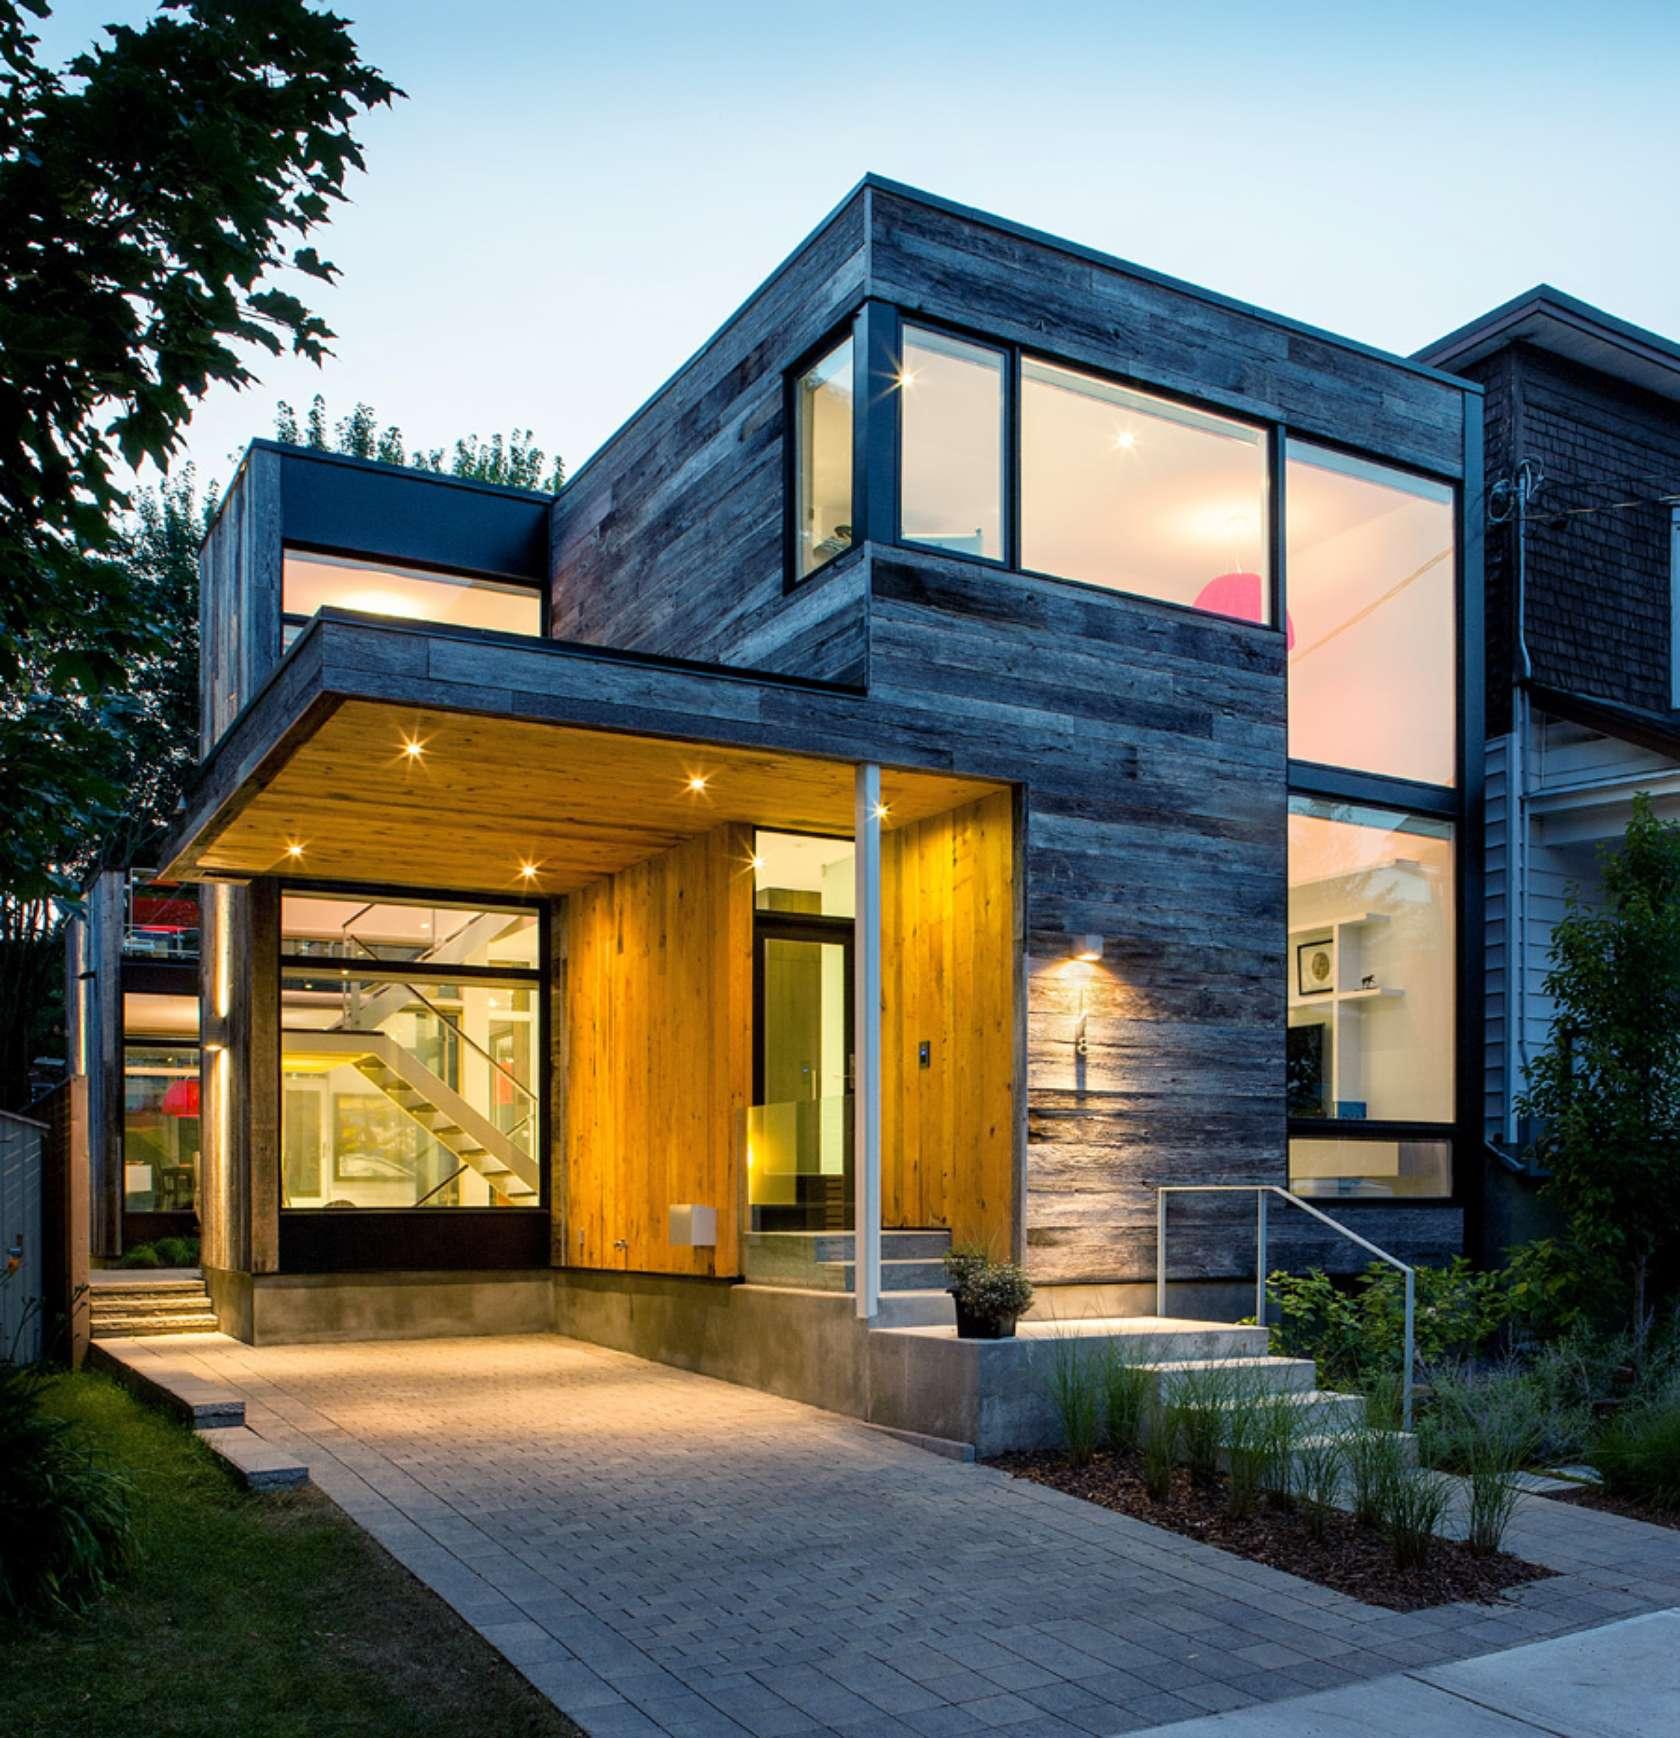 Dise o de casa de dos plantas en esquina fachada e for Fachada minimalista una planta